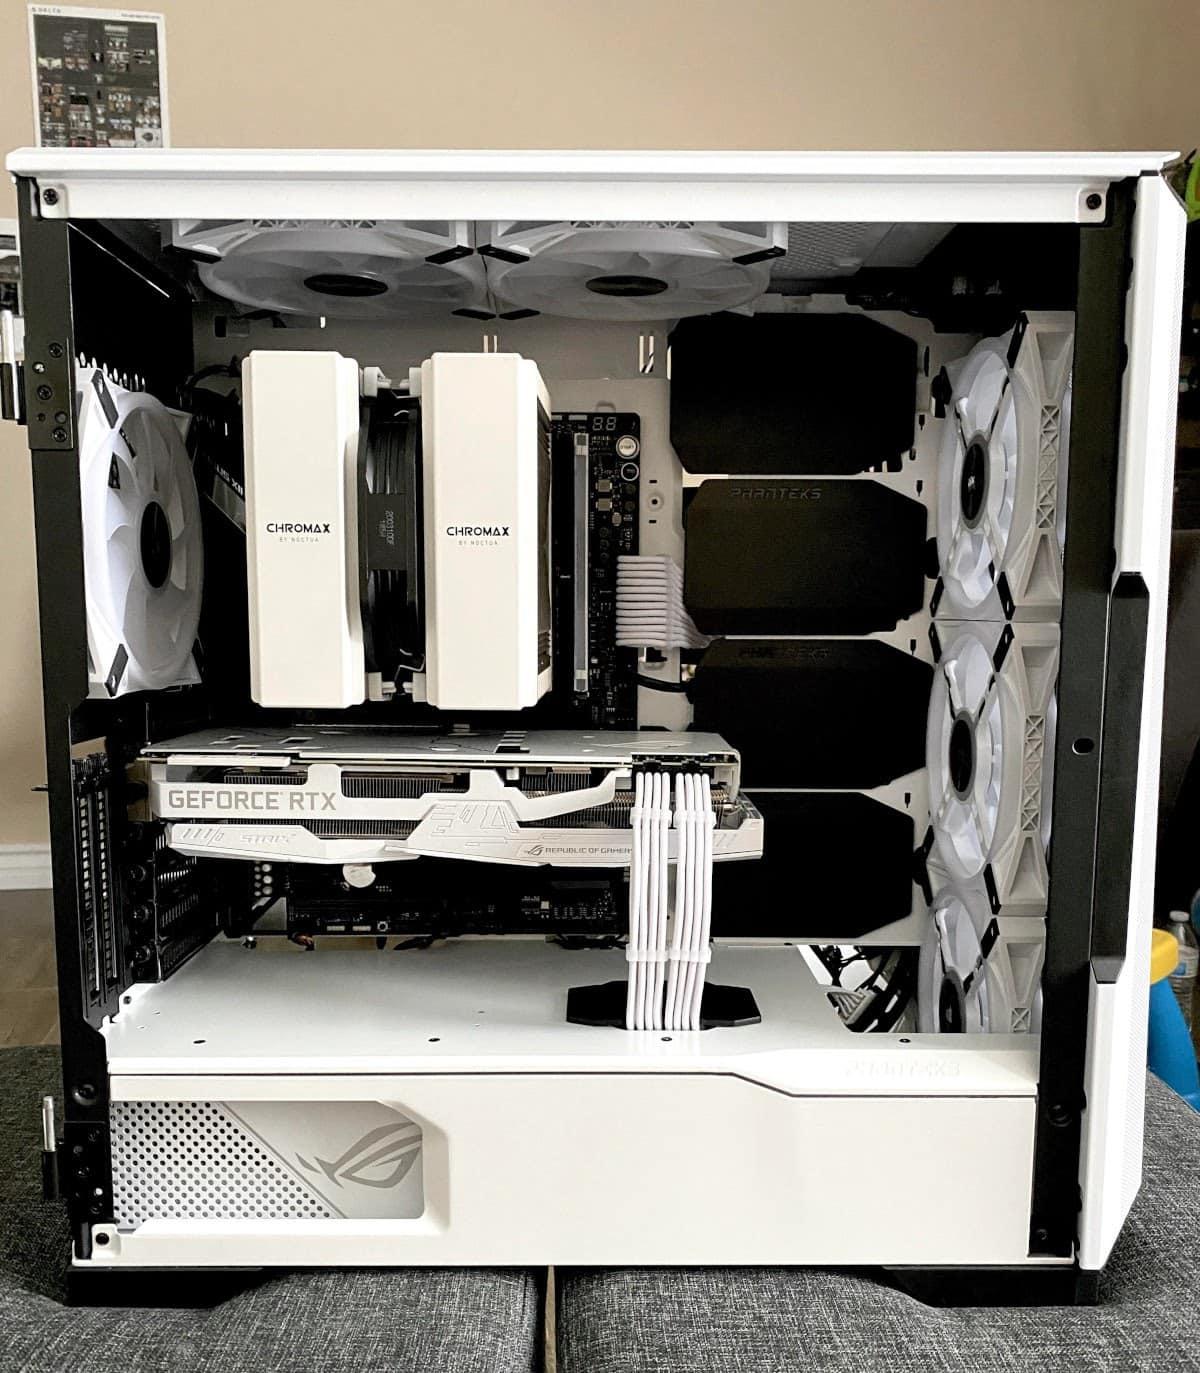 Phanteks P500A build example